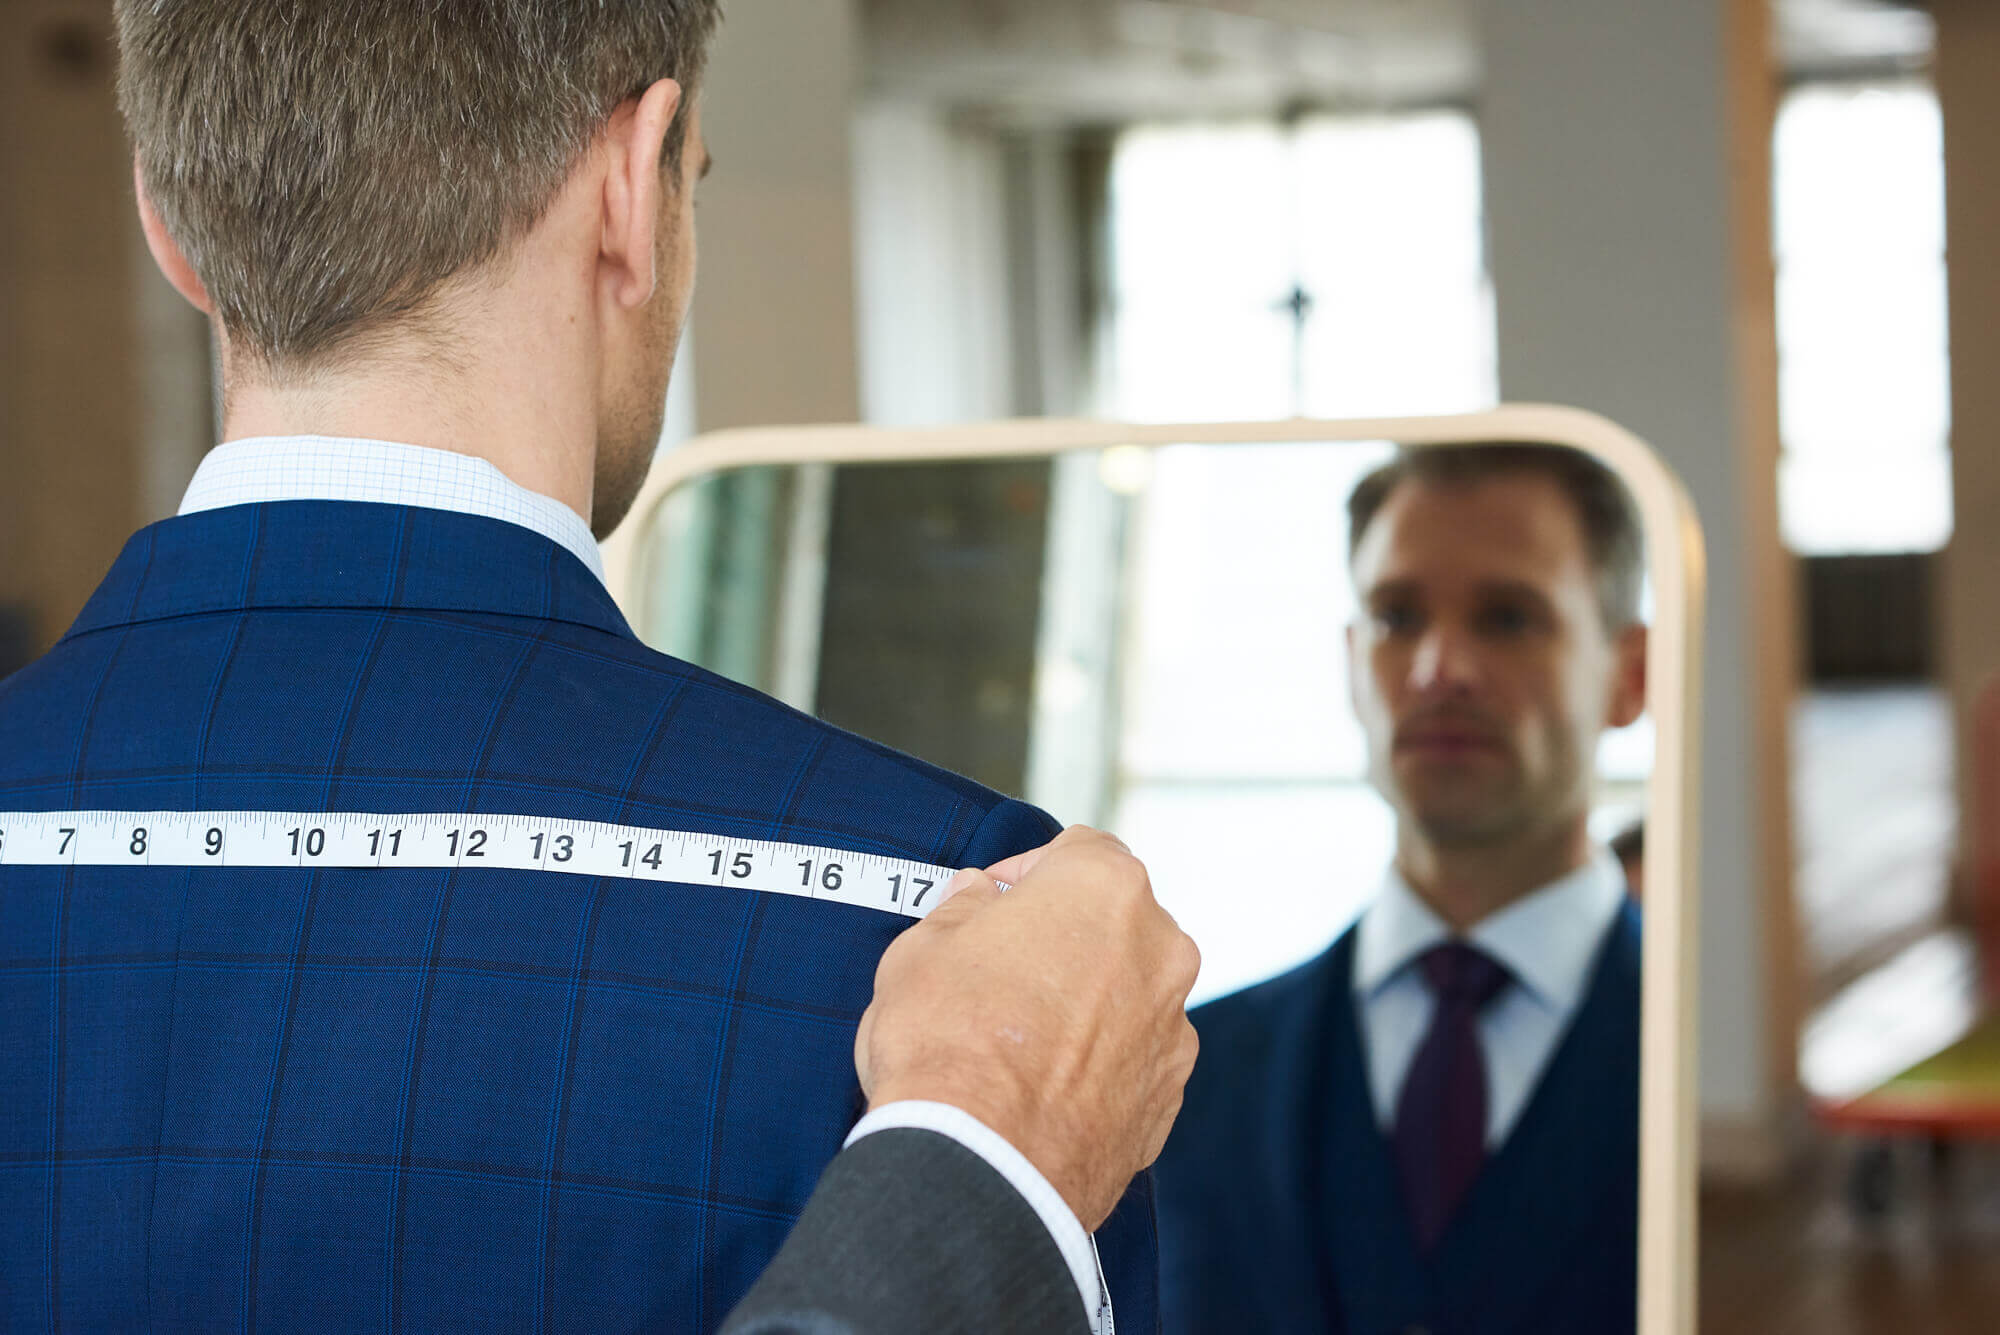 Mens Custom Tailored Bespoke Suits New York City (NYC)